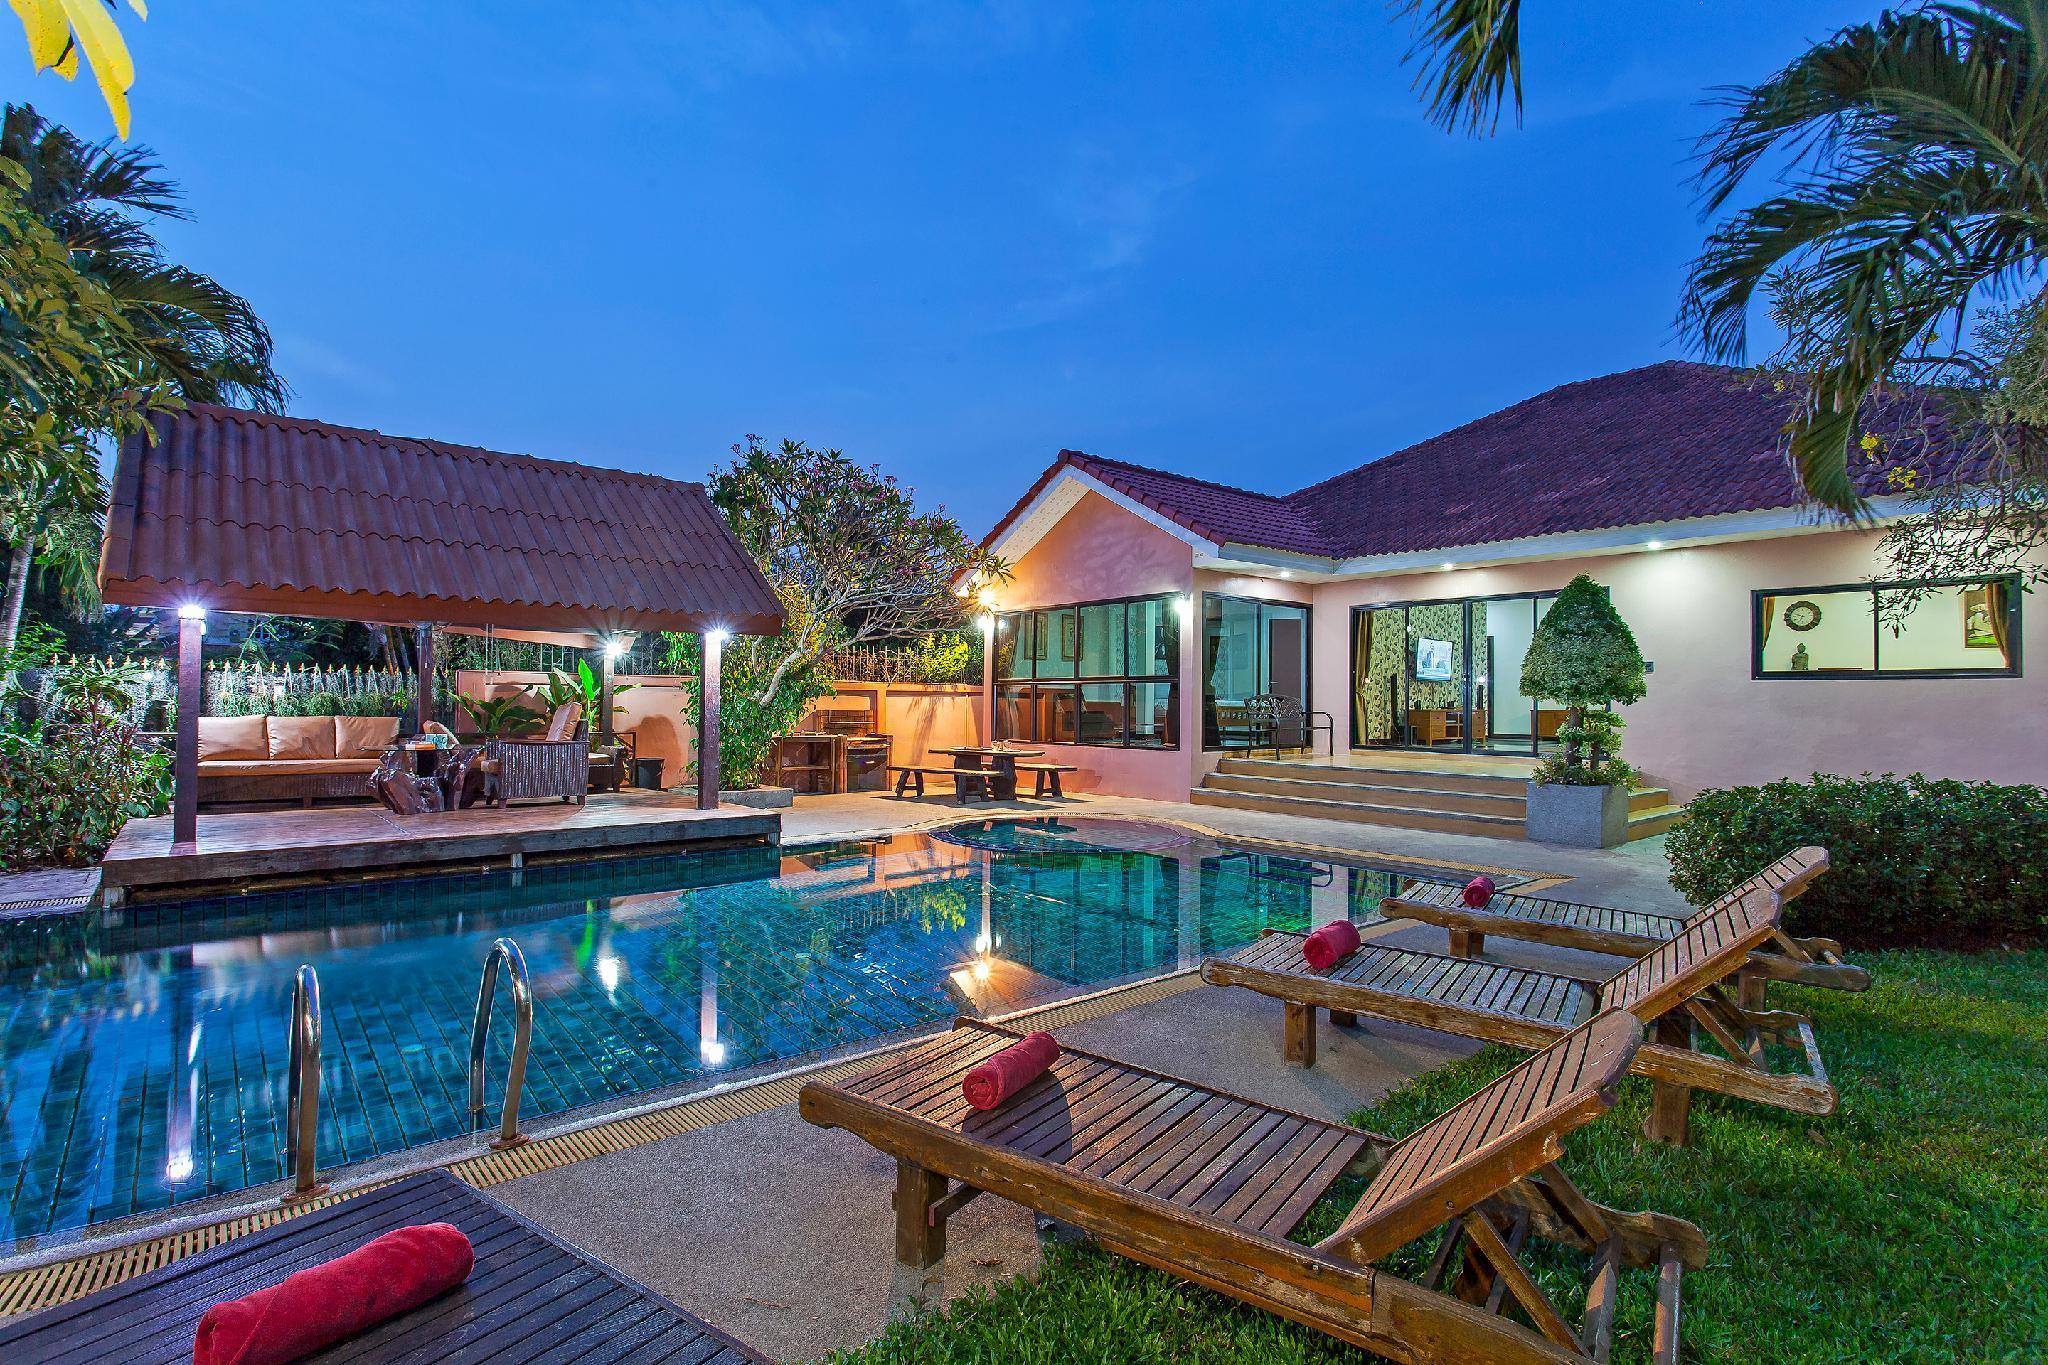 Baan Chatmanee   Beautiful 5 Bed Villa in Jomtien วิลลา 5 ห้องนอน 5 ห้องน้ำส่วนตัว ขนาด 215 ตร.ม. – หาดจอมเทียน